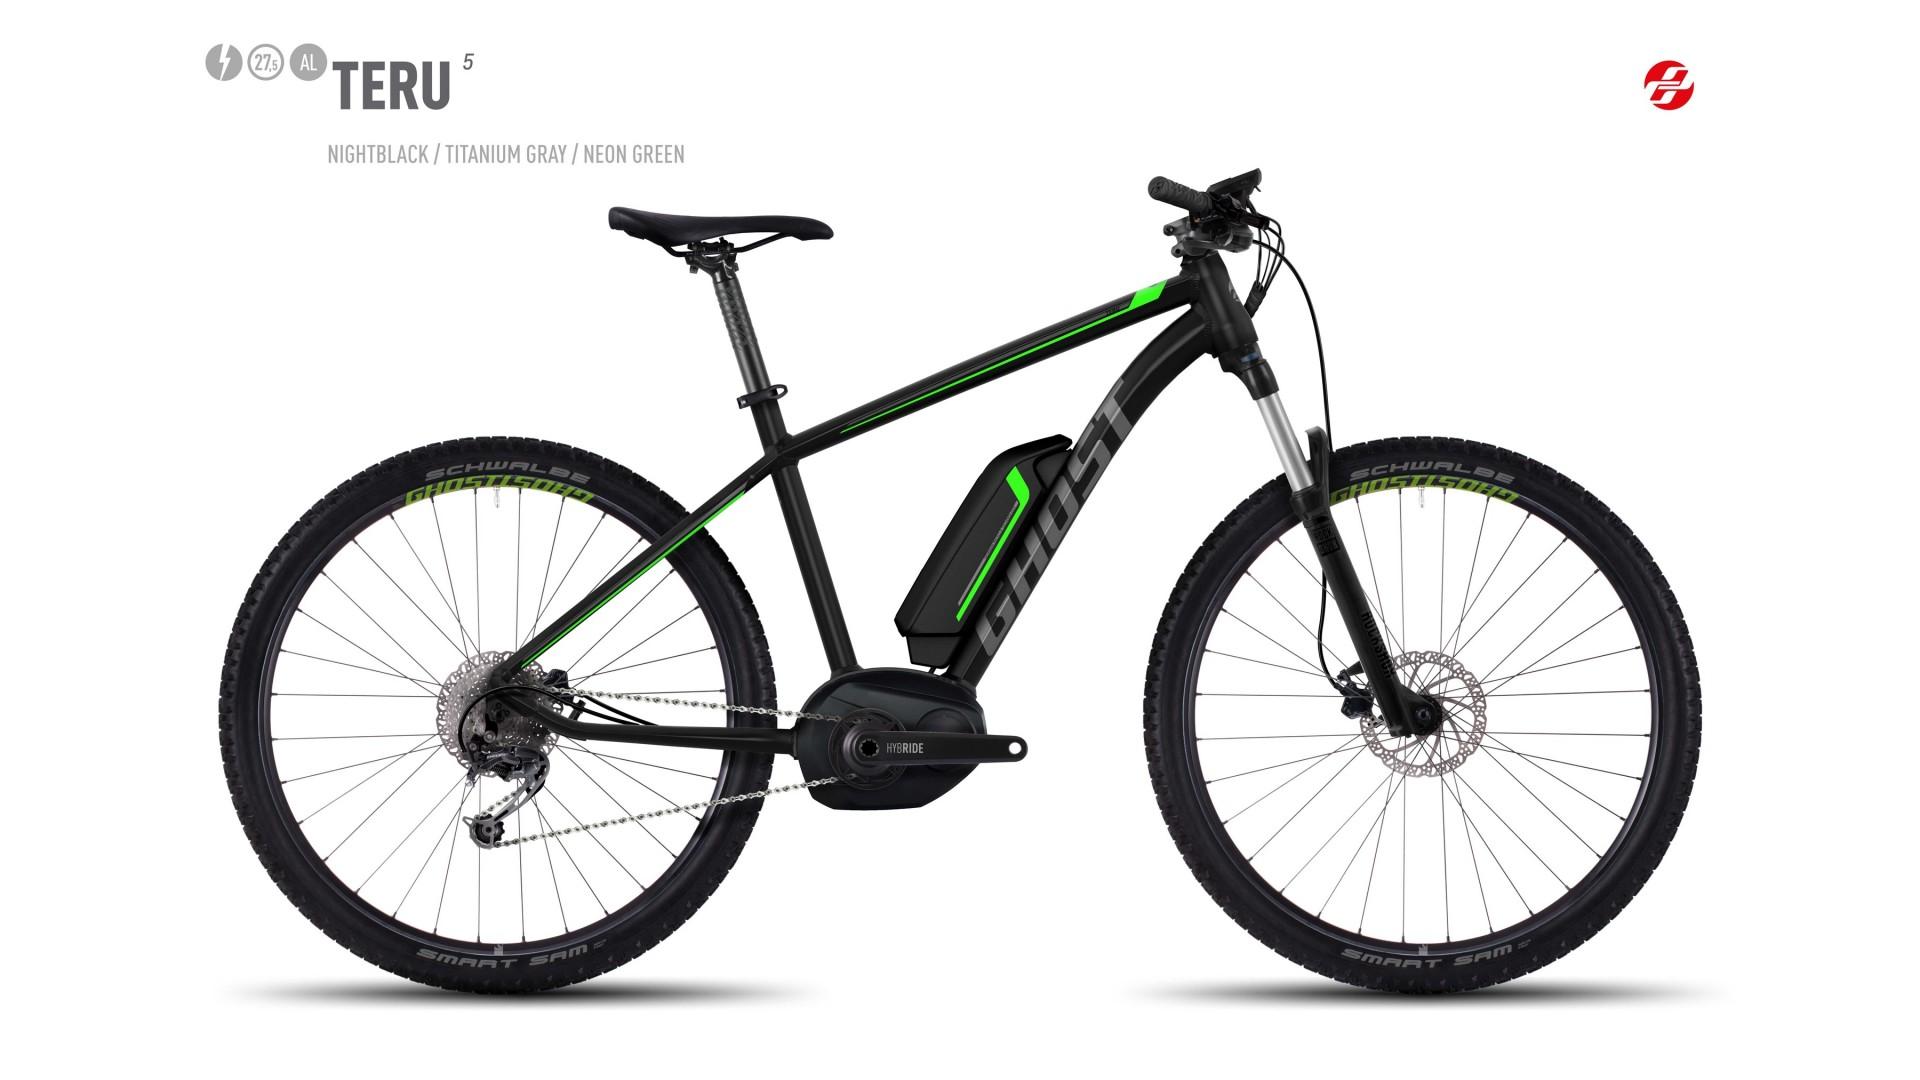 Электровелосипед GHOST Teru 5 AL 27.5 nightblack/titaniumgrey/neongreen год 2017